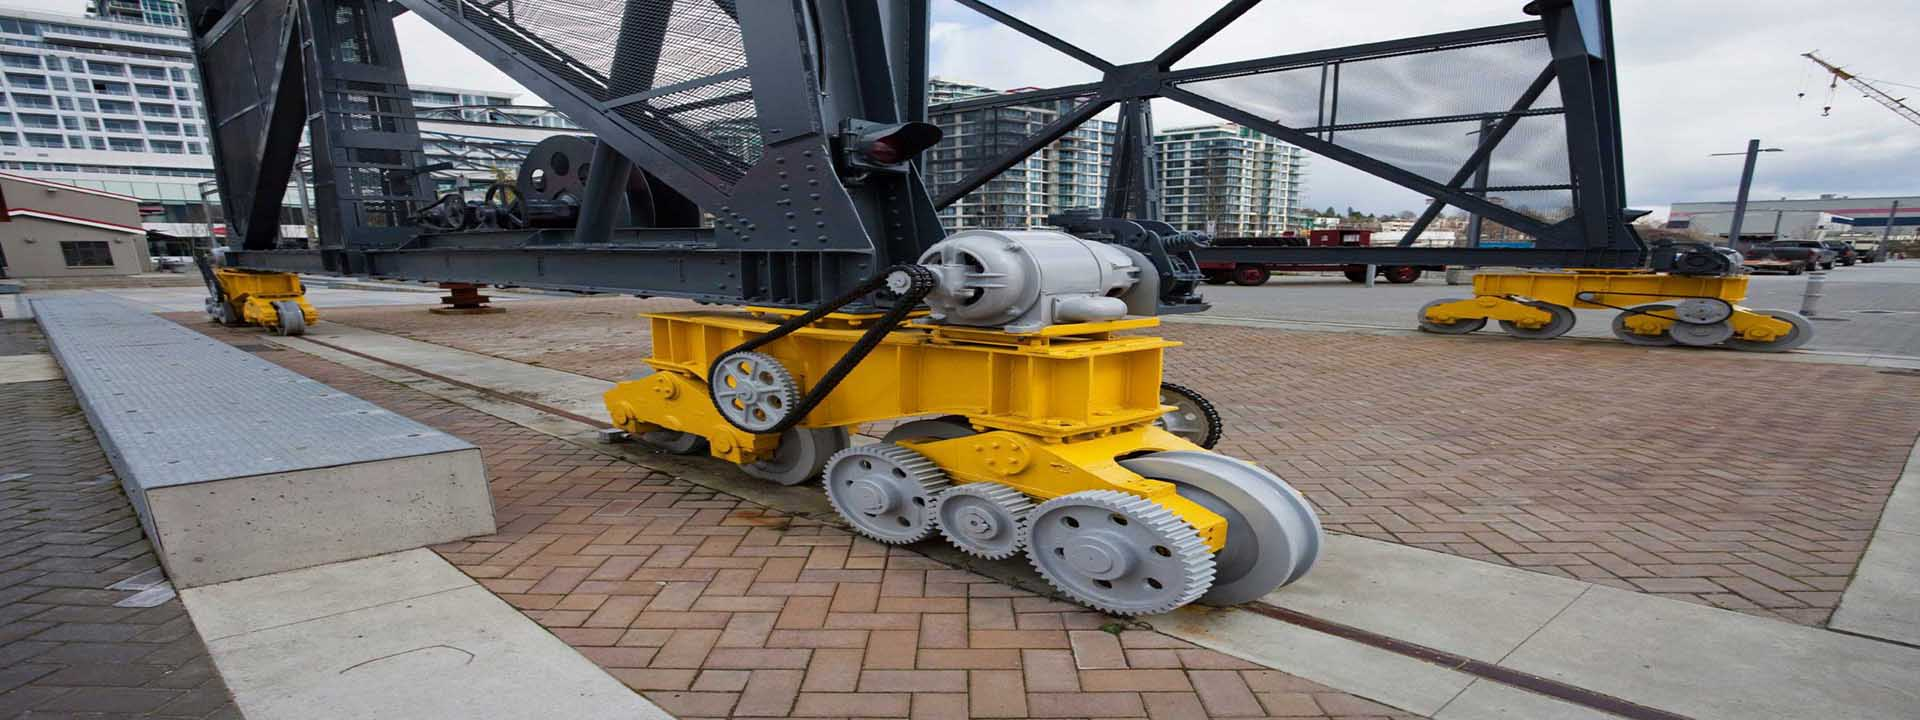 remont krana - Двухребордное колесо